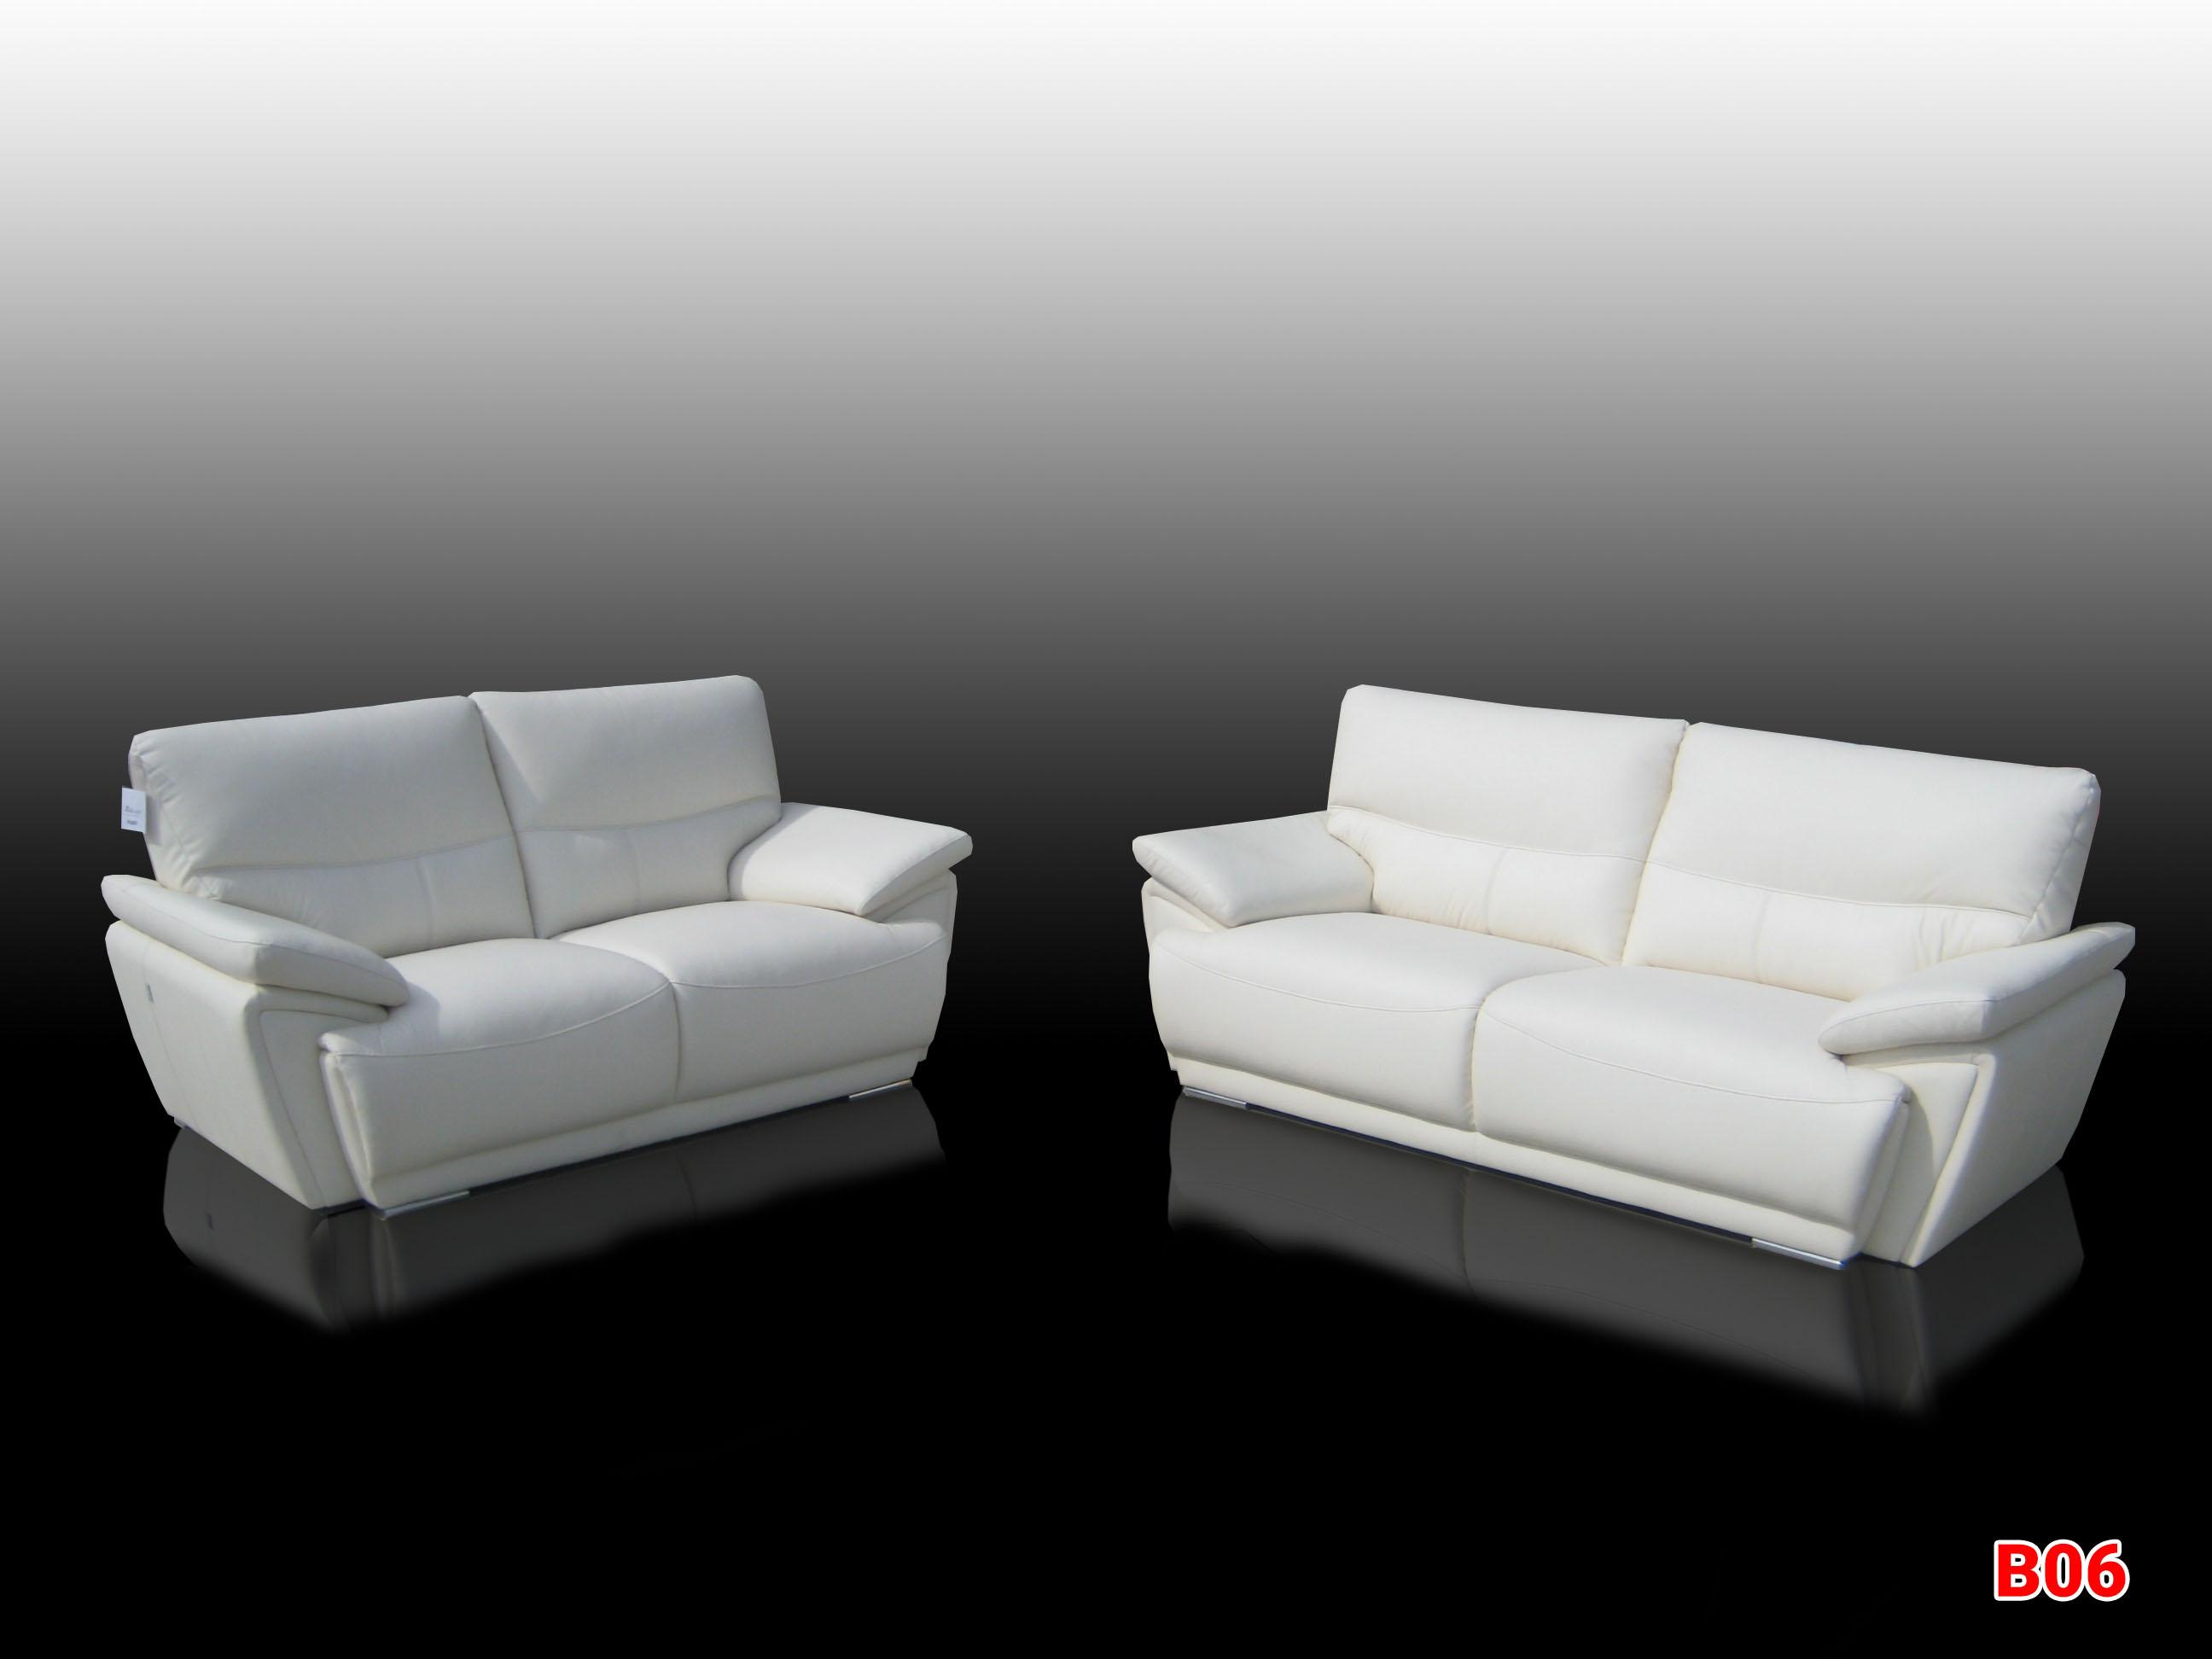 Ghế sofa da phòng khách B06